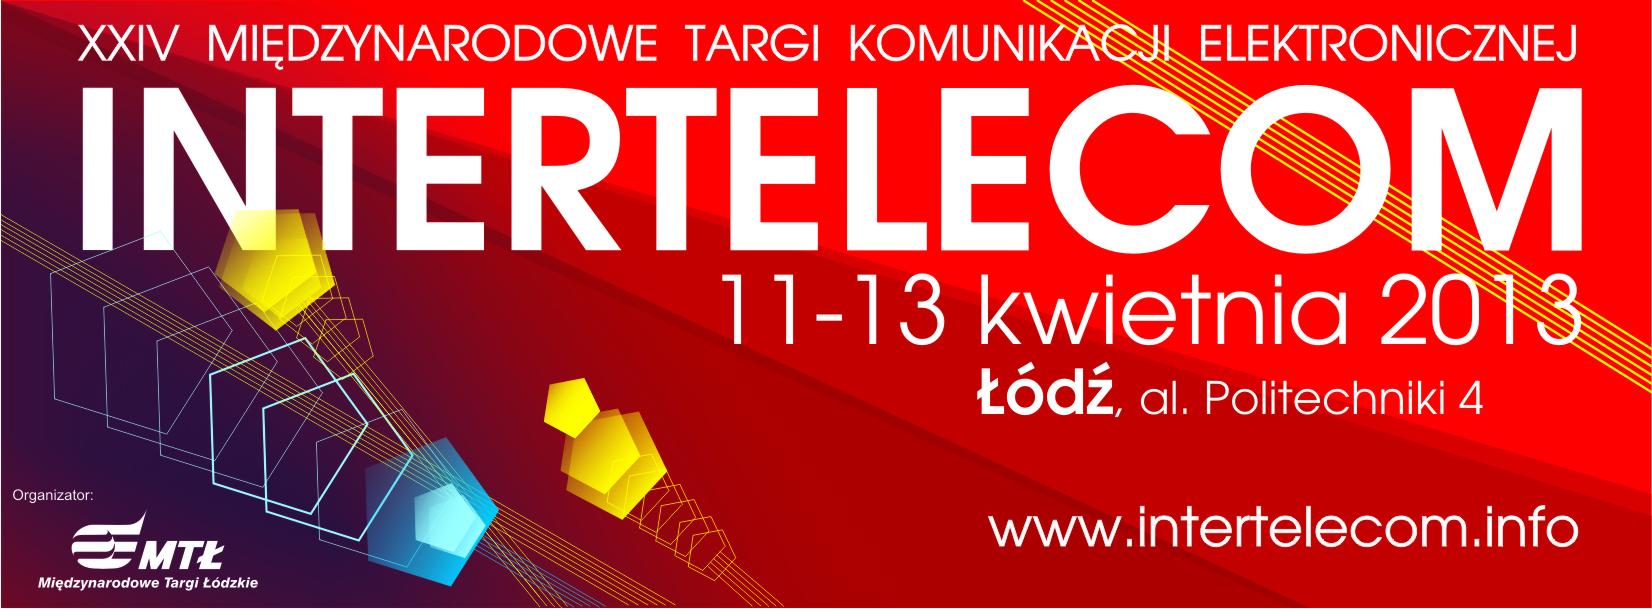 INTERTELECOM 2013INTERTELECOM 2013